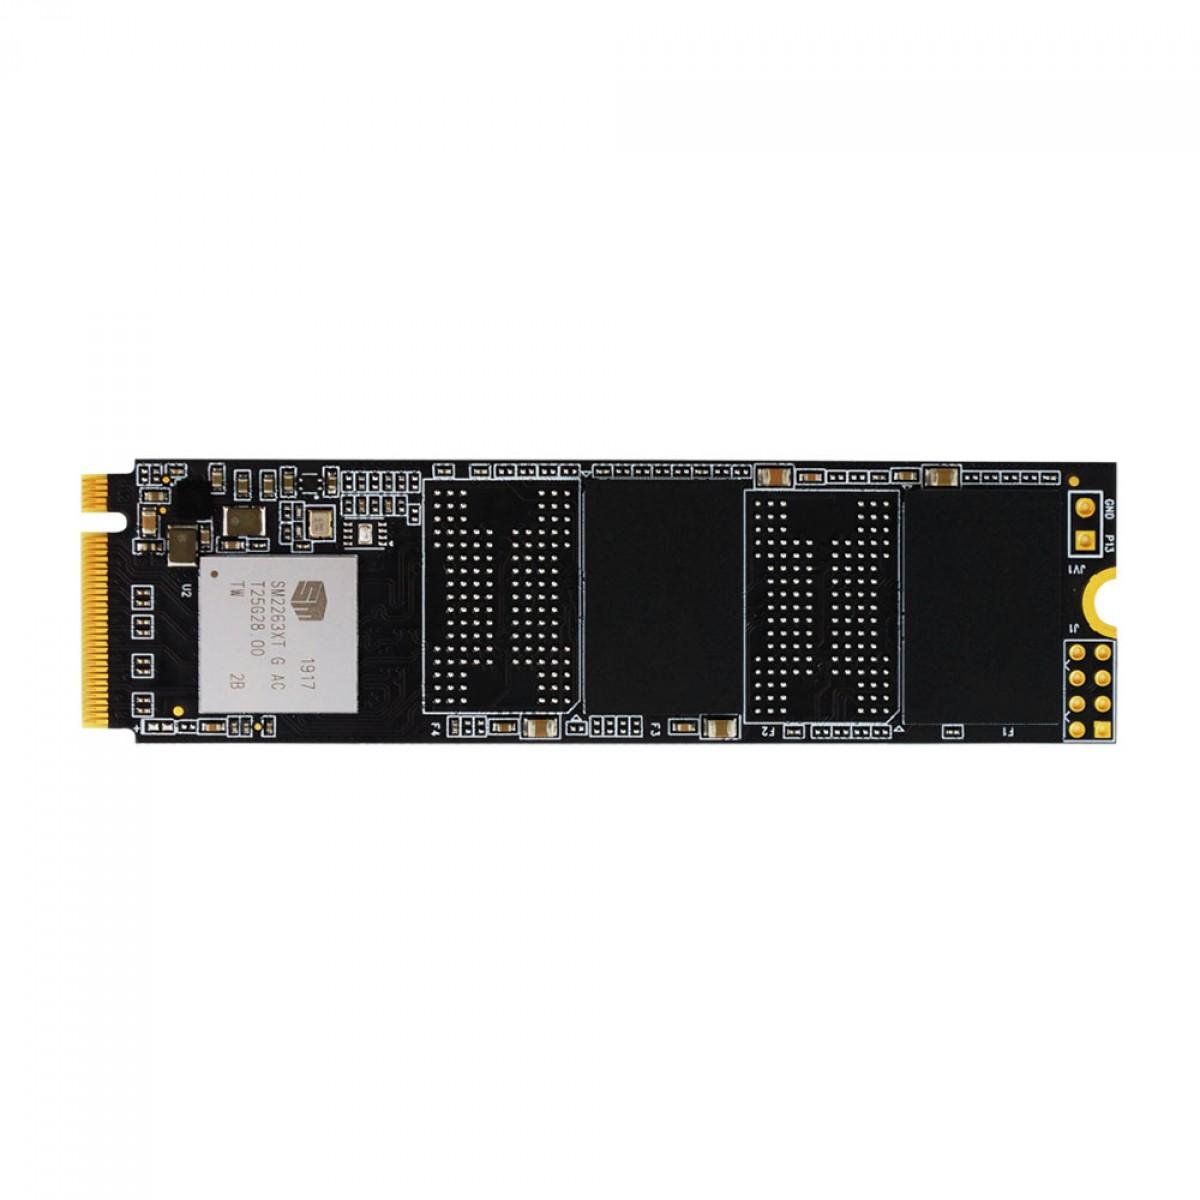 SSD Biostar M700, 256GB, M.2 2280, NVMe, Leitura 1850MBs e Gravação 950MBs, SS263PME32-PS1SH-BS2